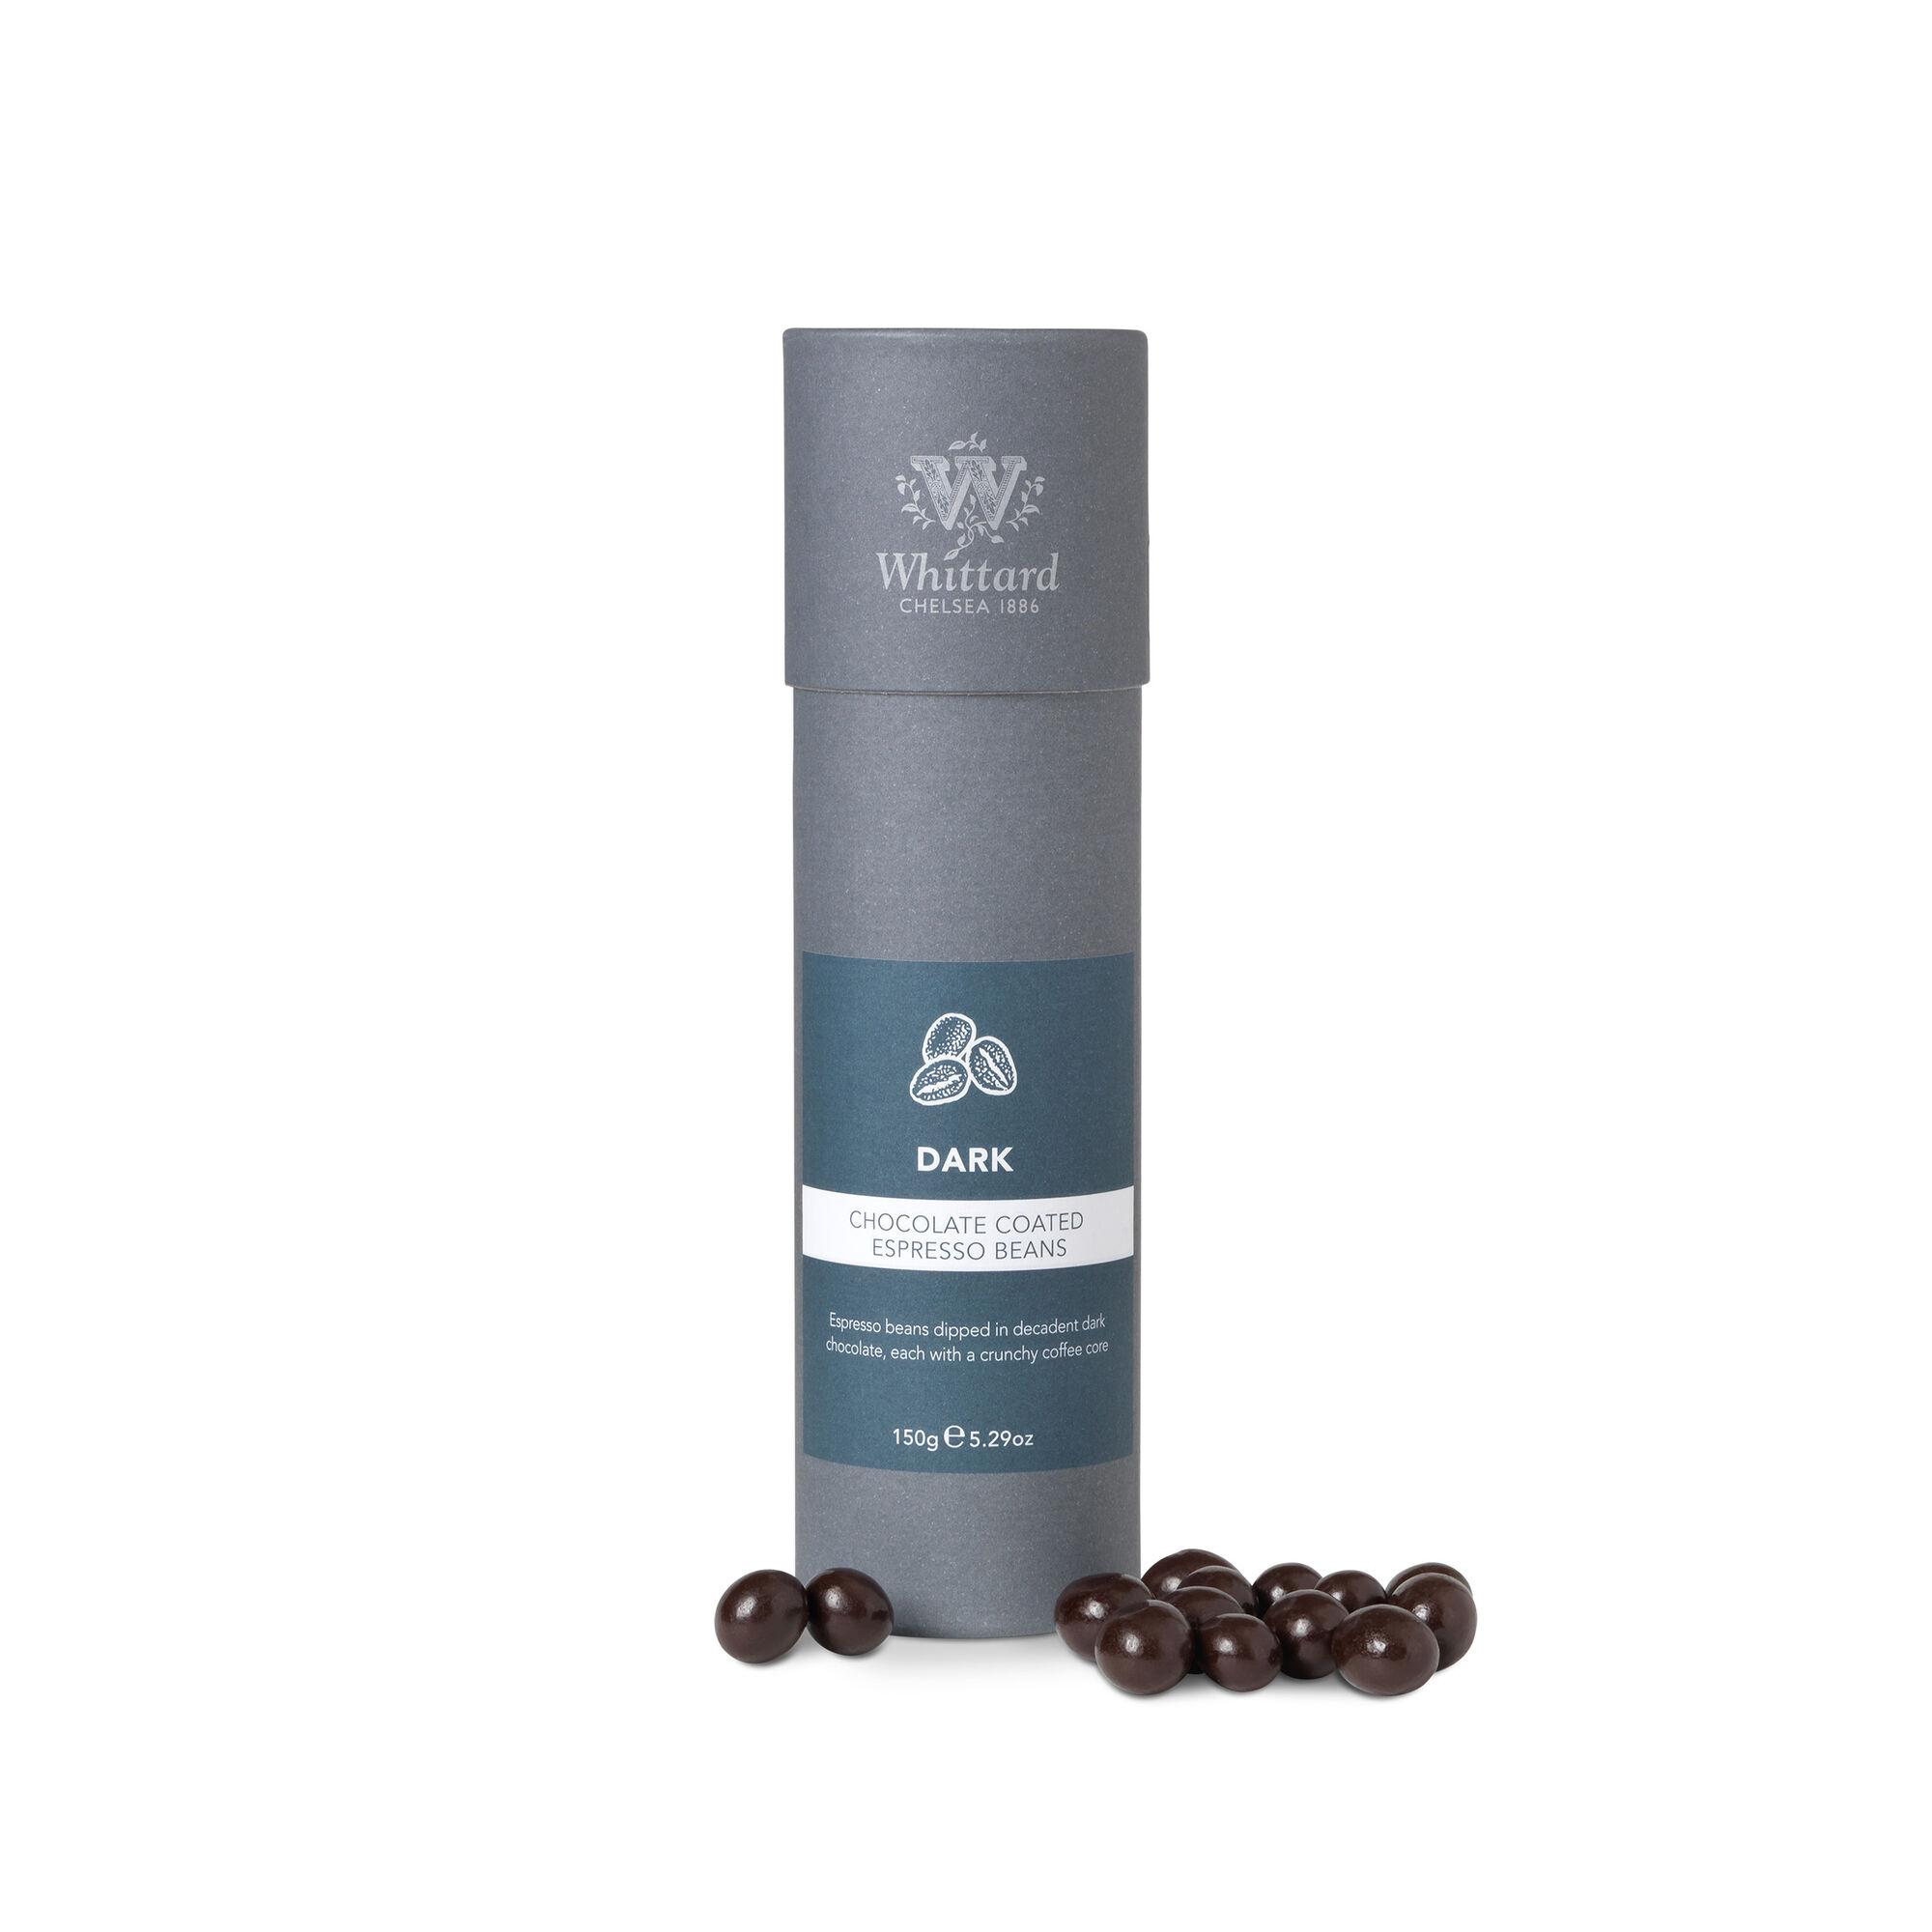 Dark Chocolate Coated Espresso Beans Whittard Of Chelsea